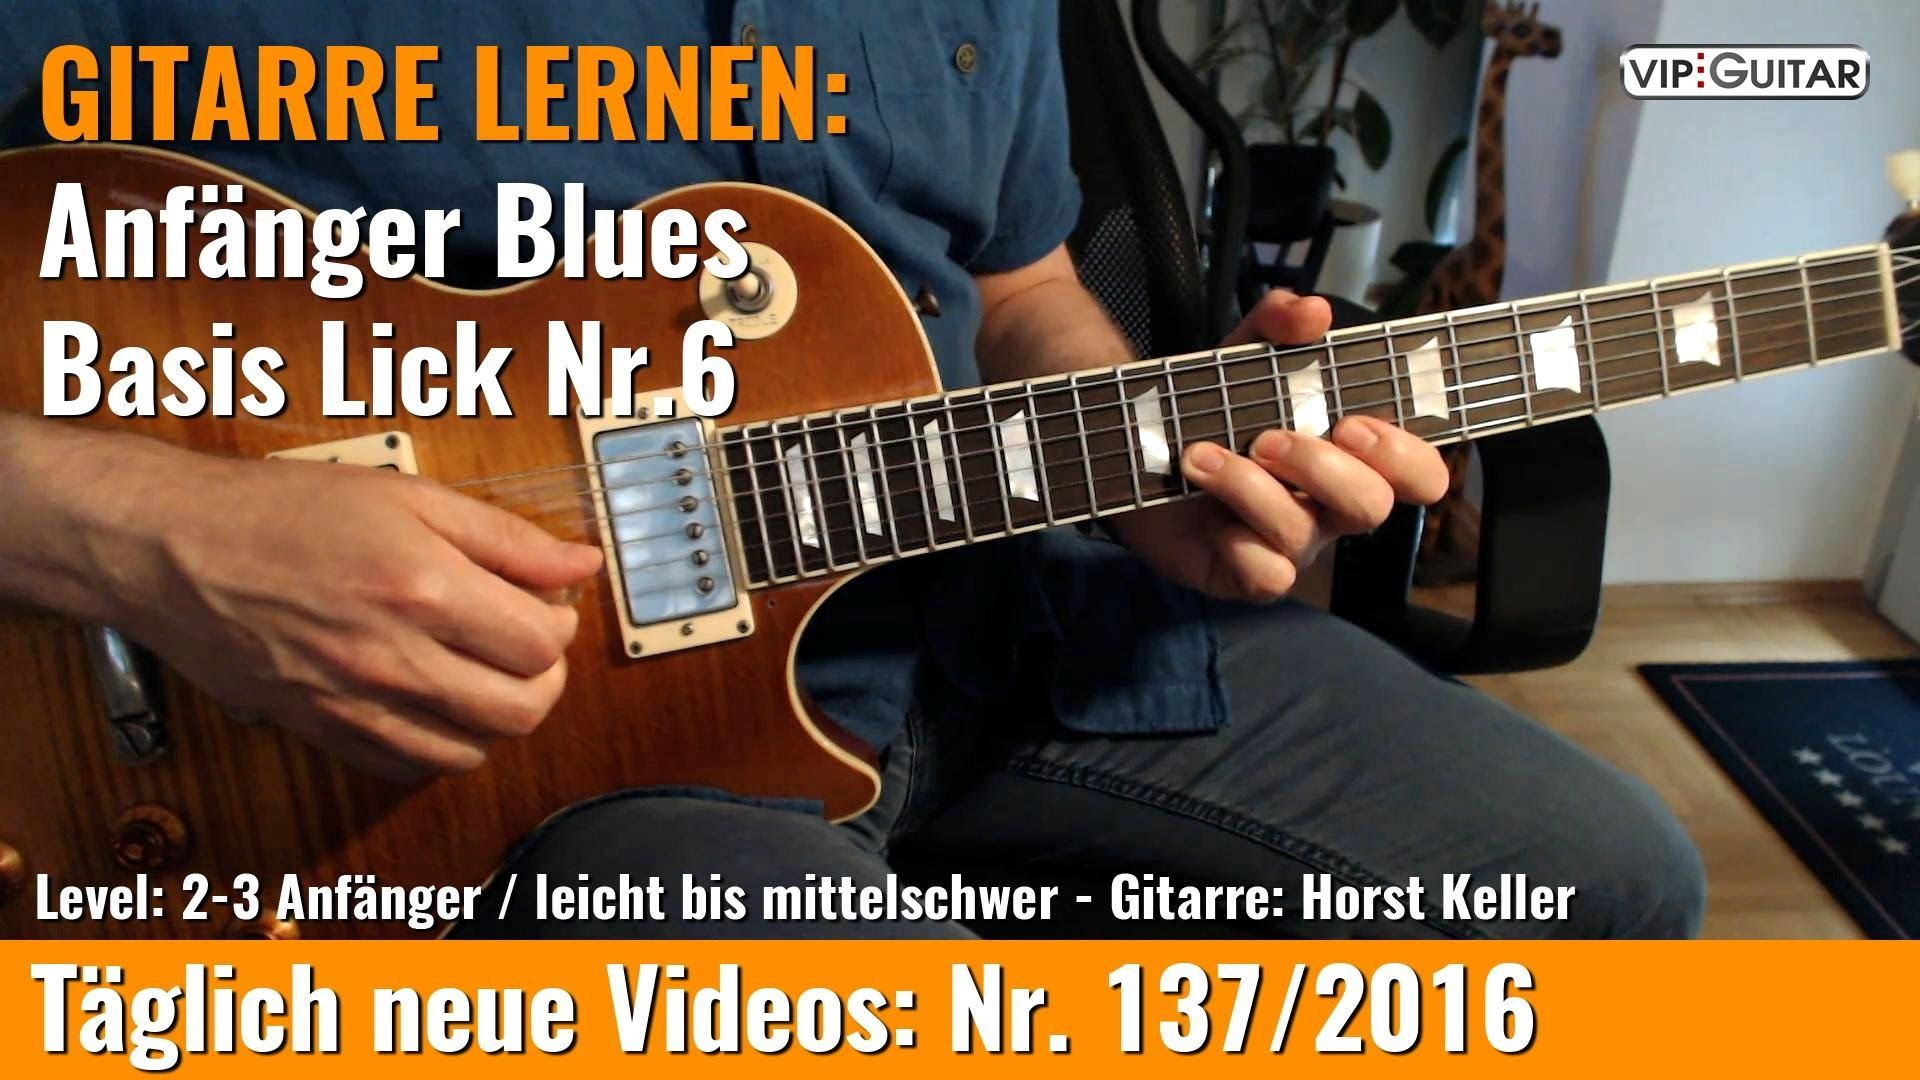 GITARRE LERNEN Anfänger Blues ■Basis Lick Nr 6